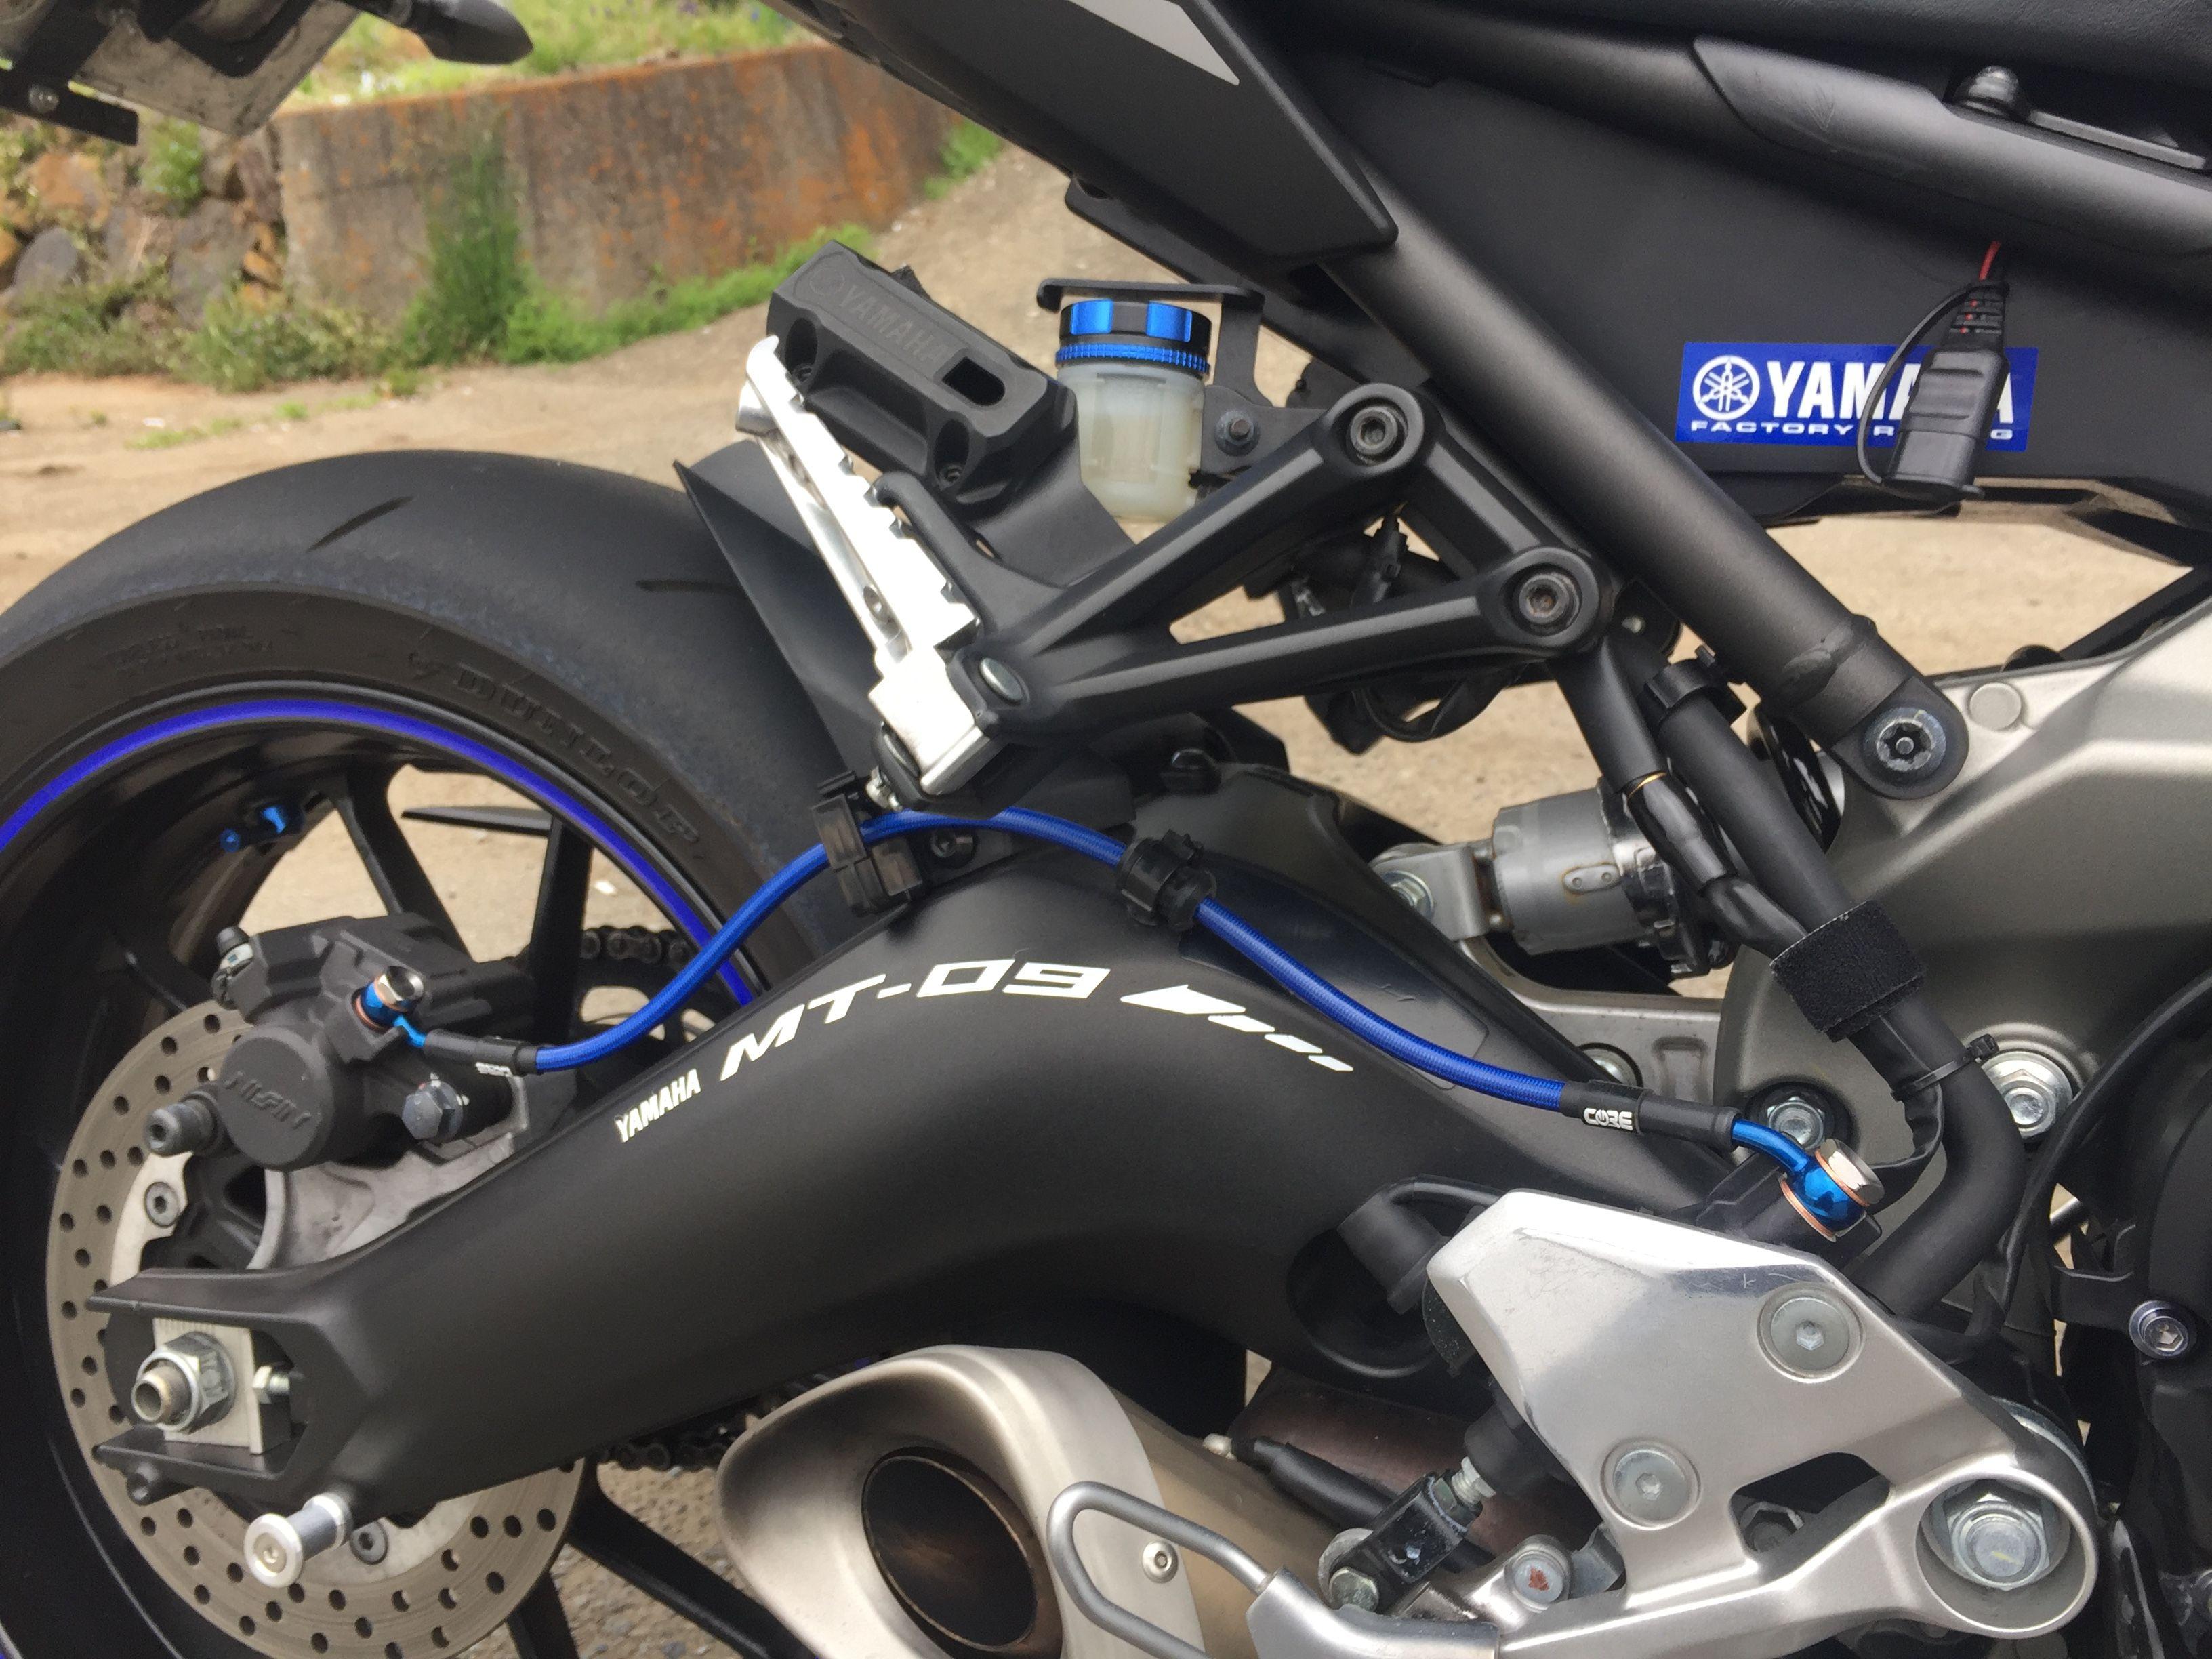 Moto yamaha scrambler cars motorcycles bobber forward mt09 yamaha - Coremoto Mt 09